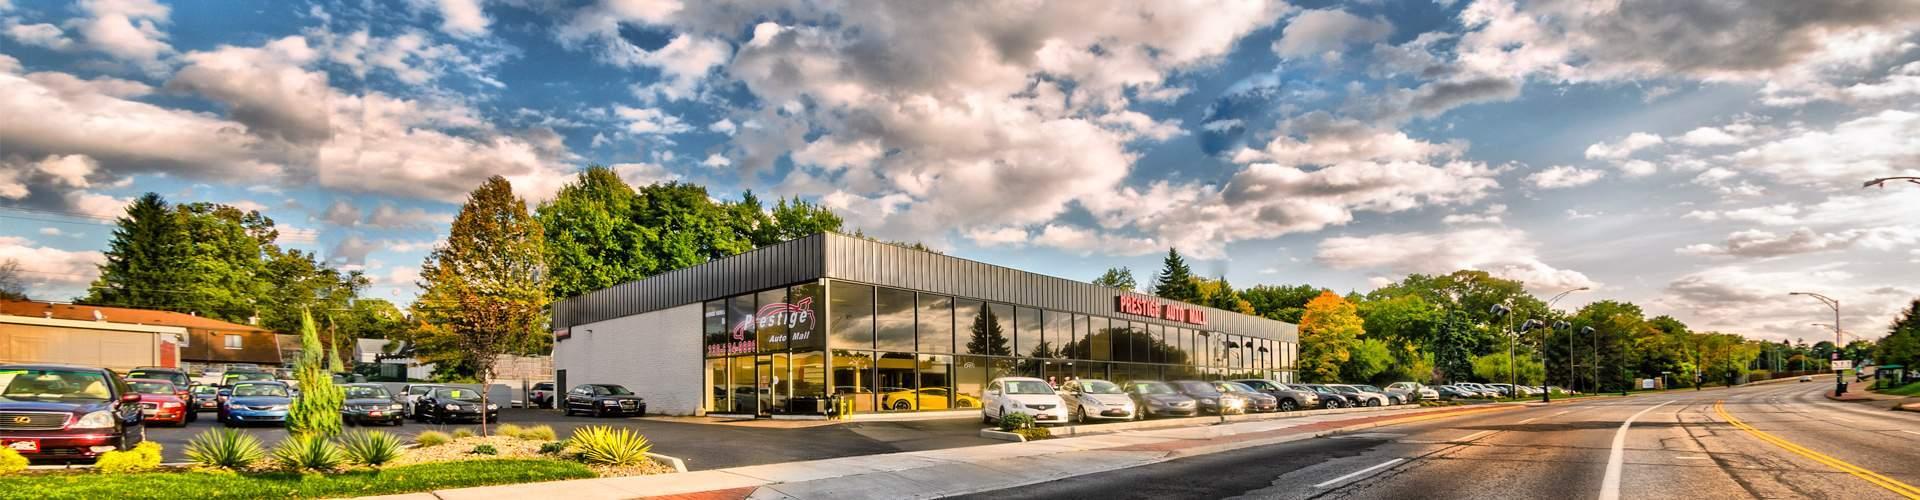 prestige auto mall used car dealership cuyahoga falls oh autos post. Black Bedroom Furniture Sets. Home Design Ideas